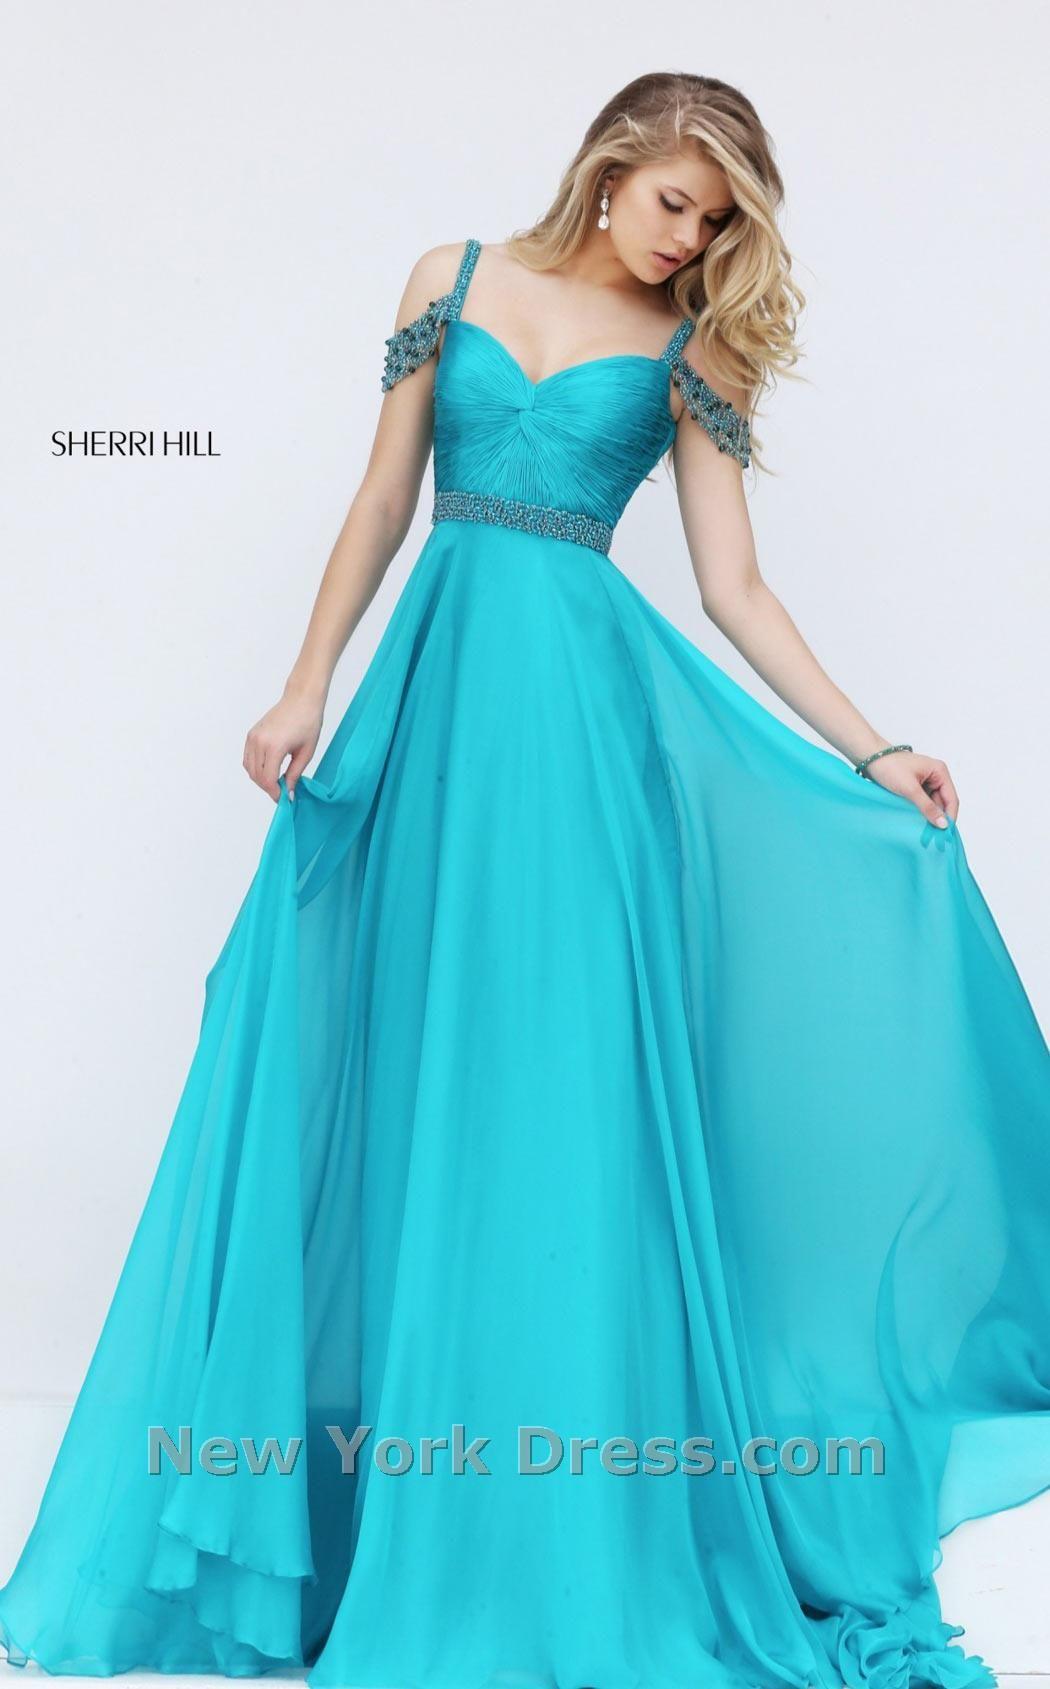 Sticks n stones prom dresses under $50 | Best dress ideas ...